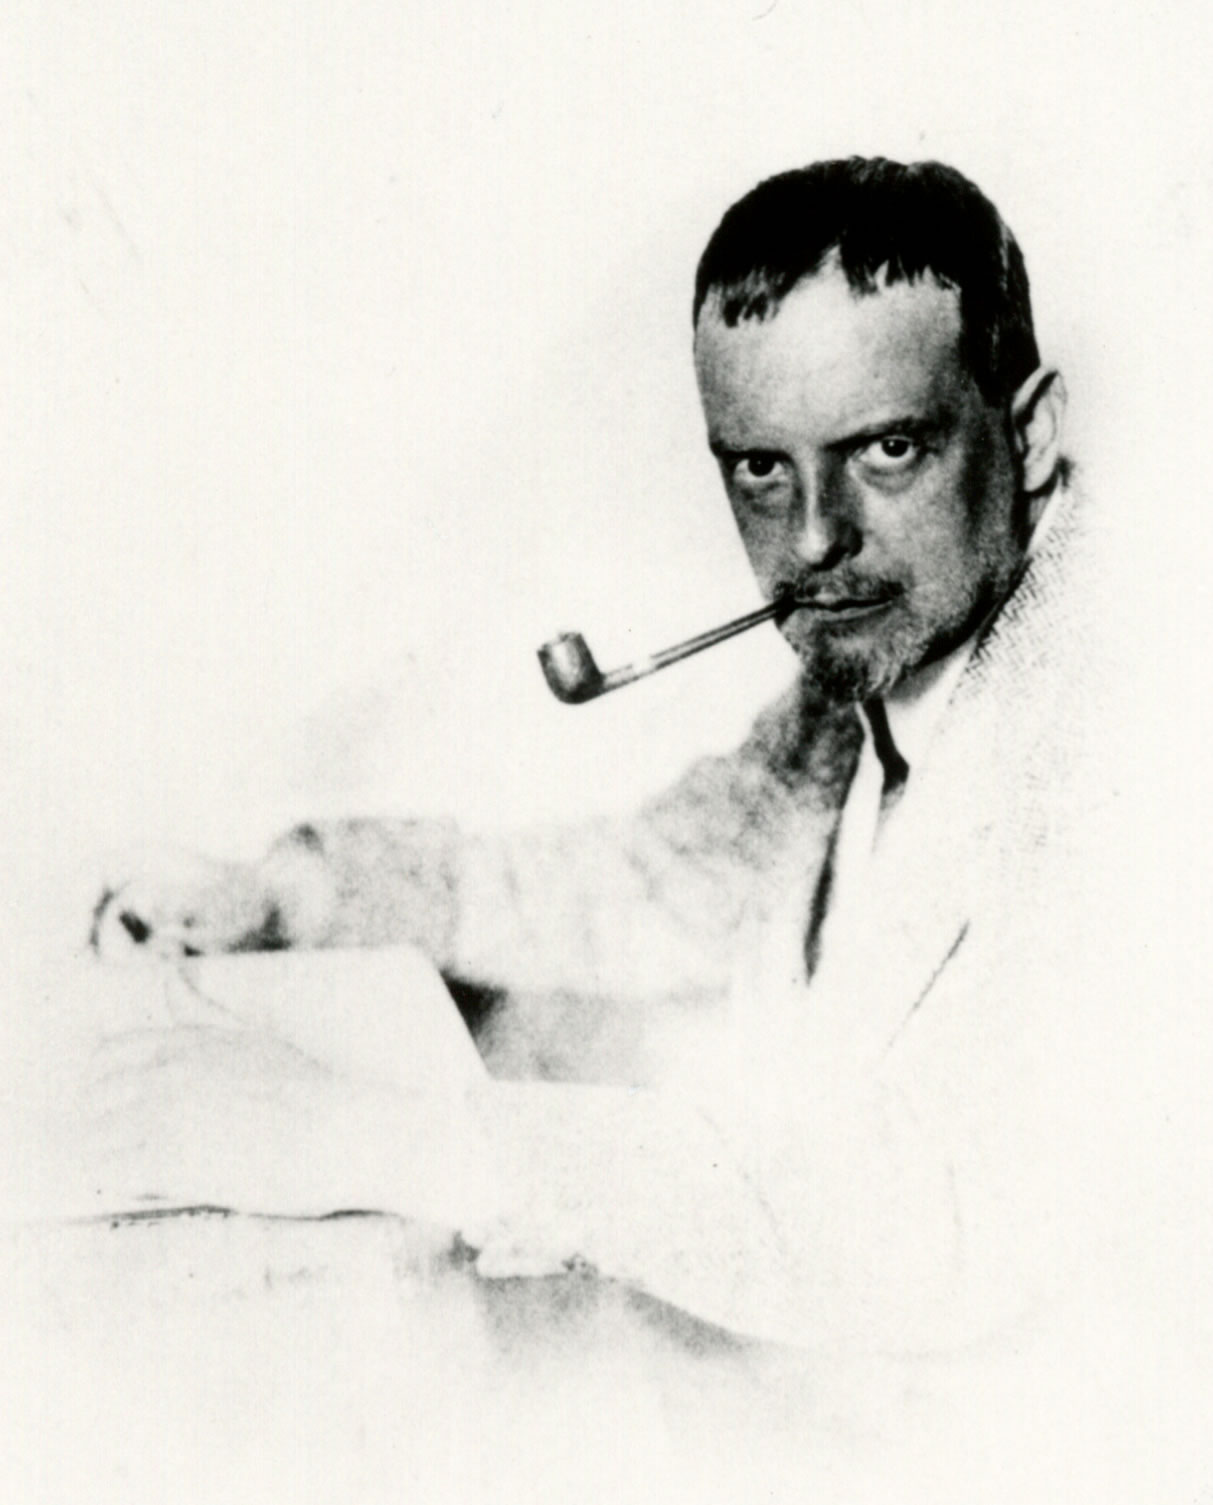 Paul Klee, Norton Simon Museum, The Blue Four Galka Scheyer Collection Archives, Pasadena, California